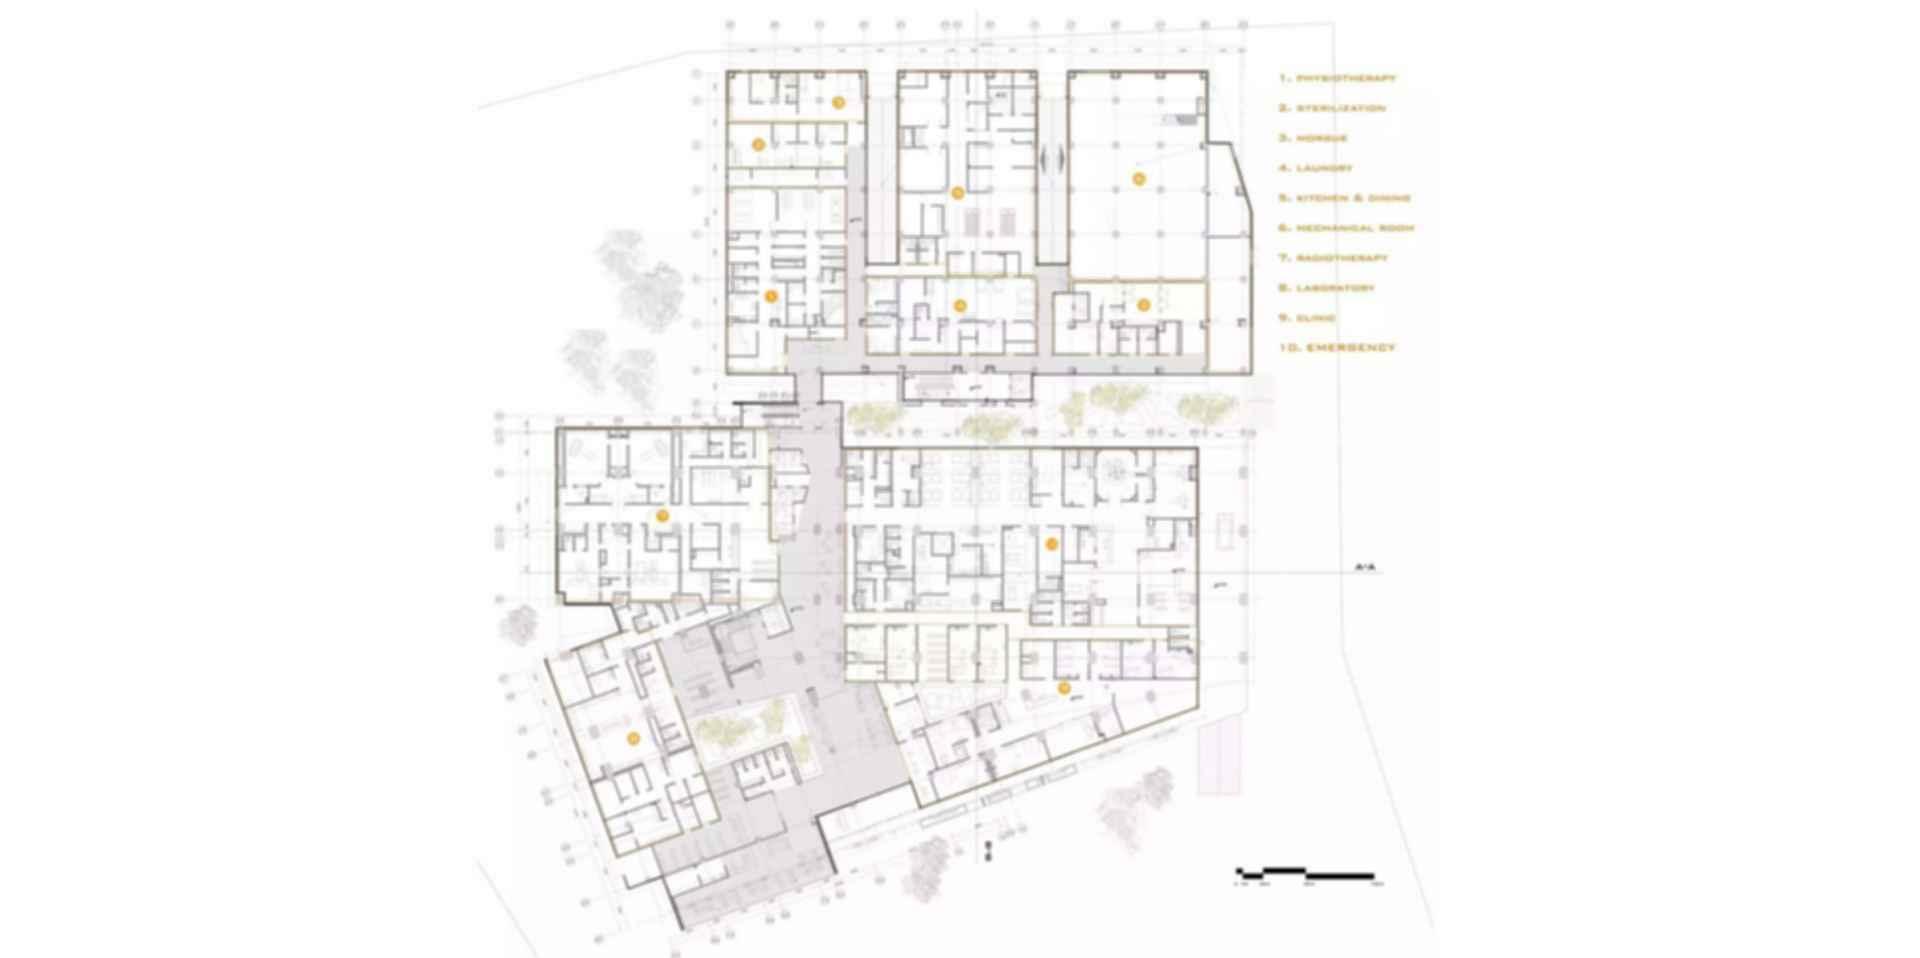 Pars Hospital - Floor Plan